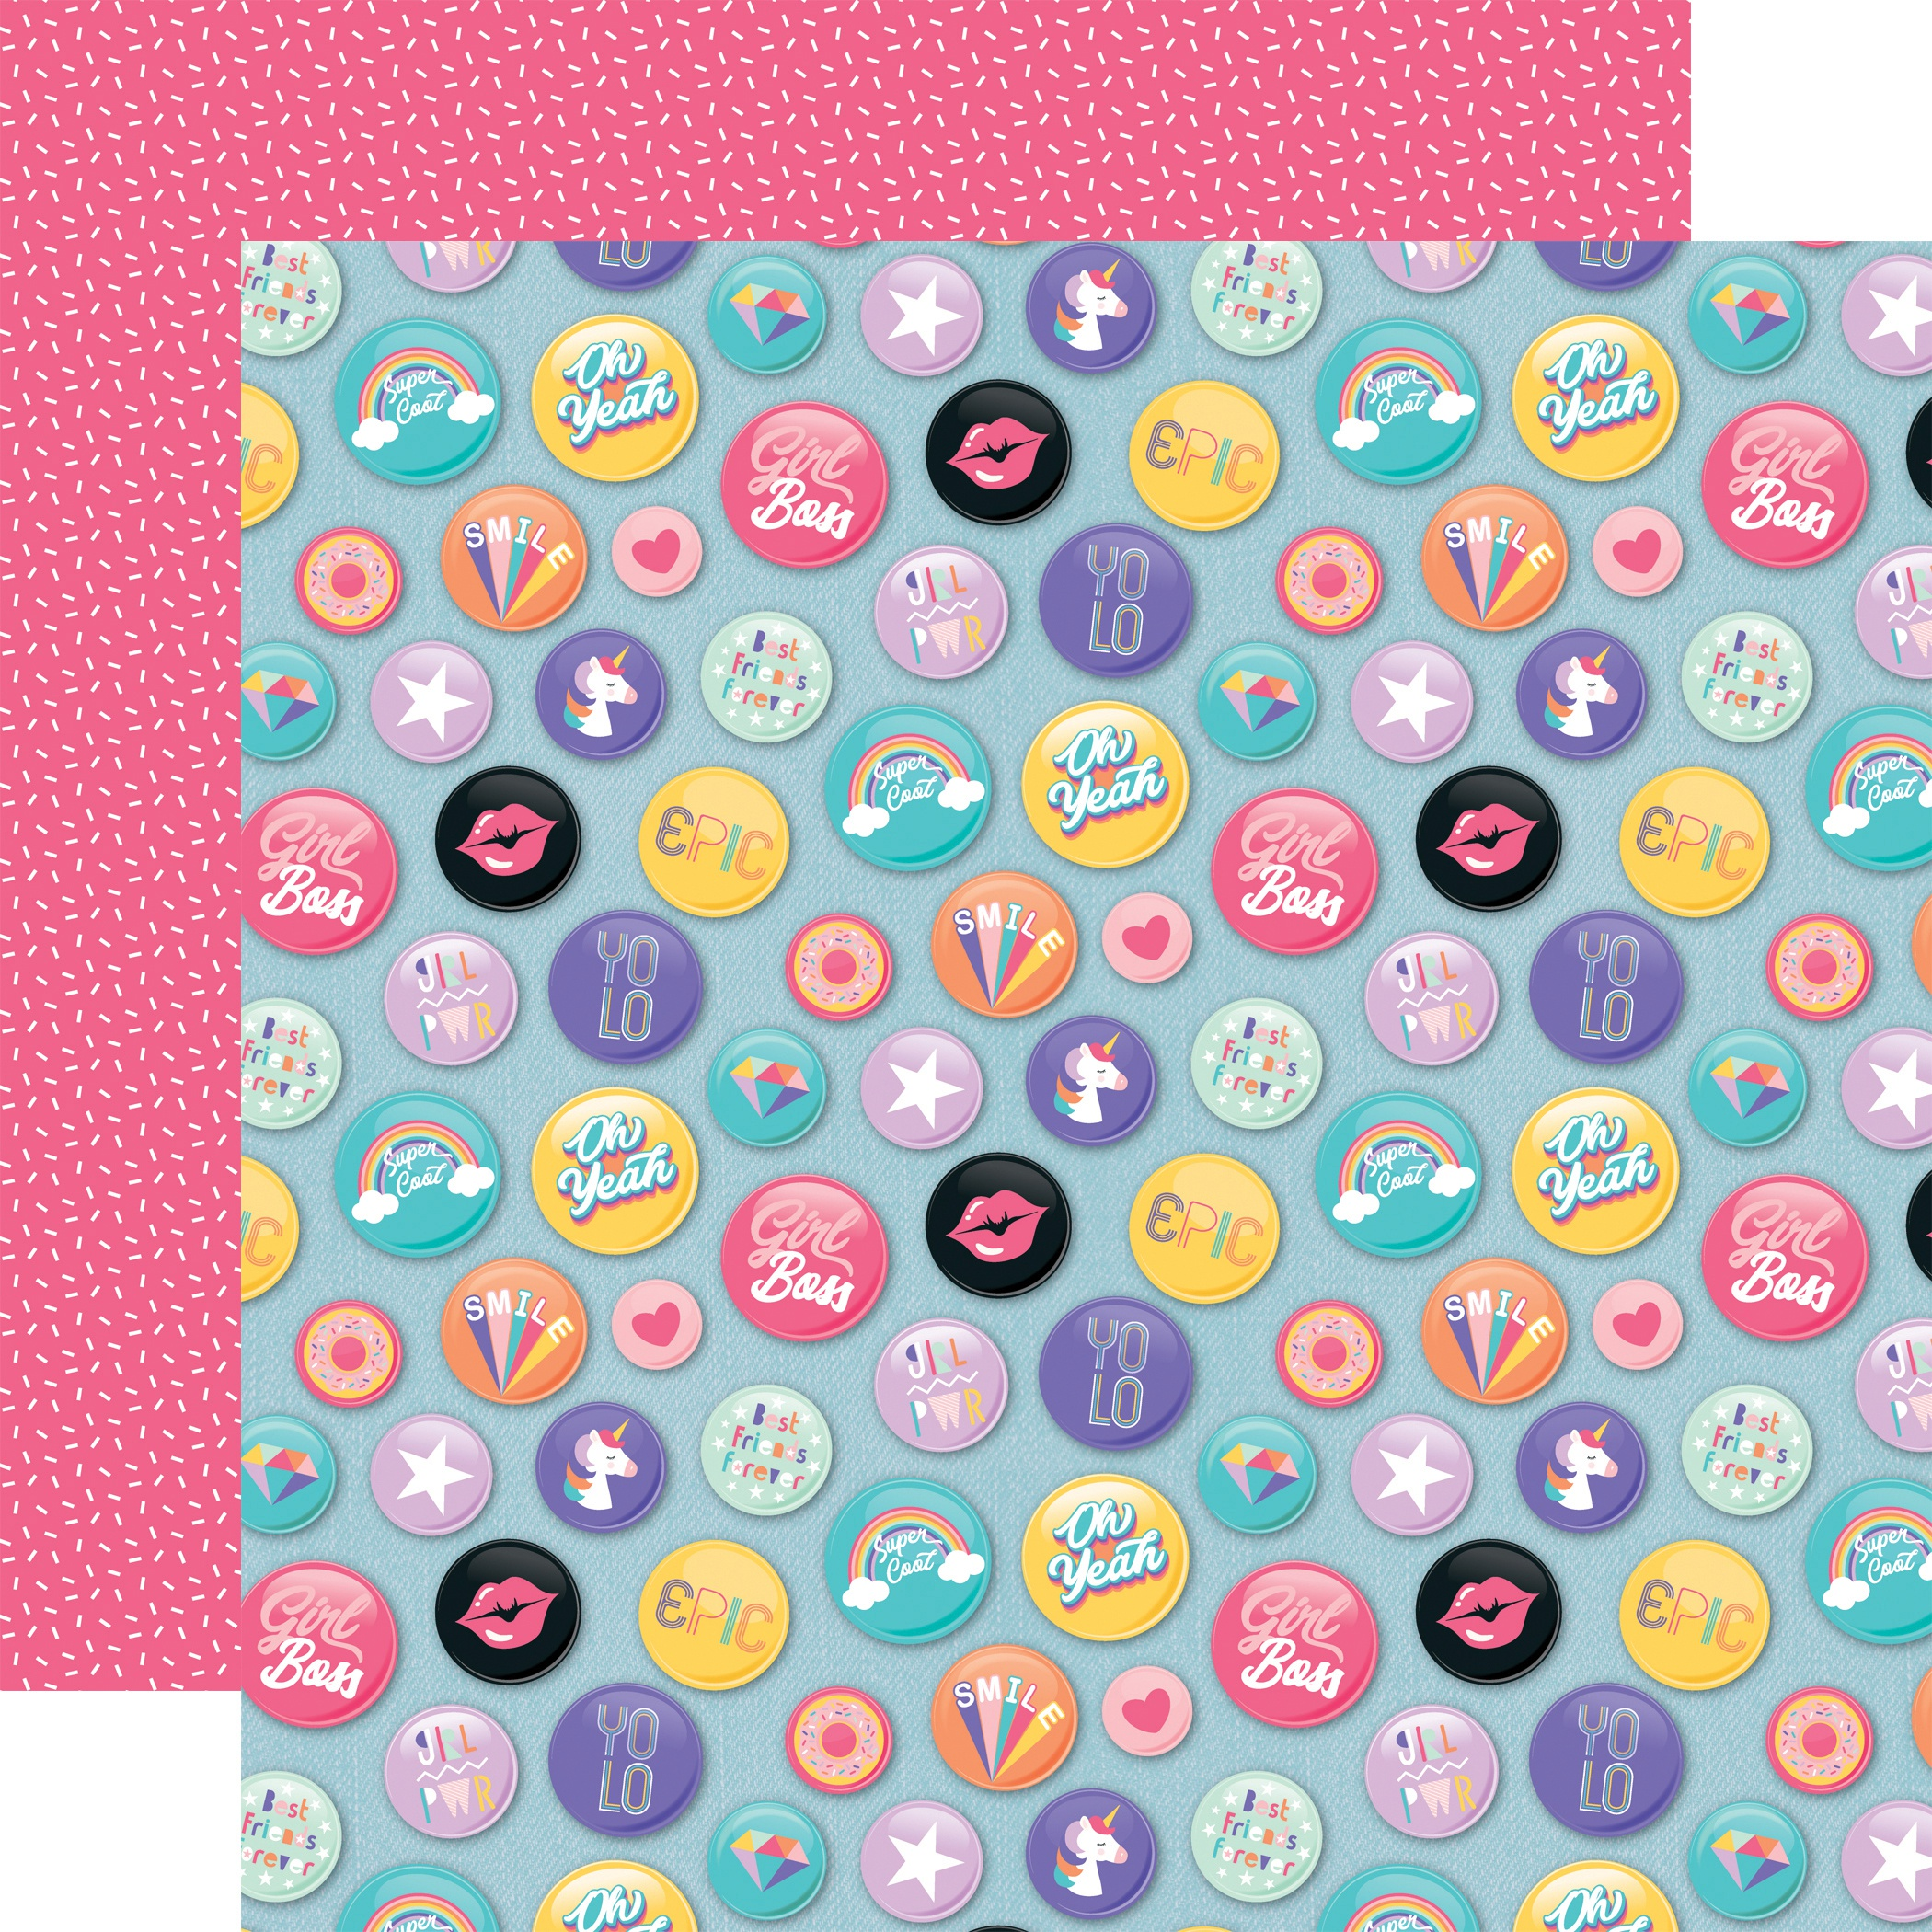 EP Teen Spirit Girl Epic Buttons